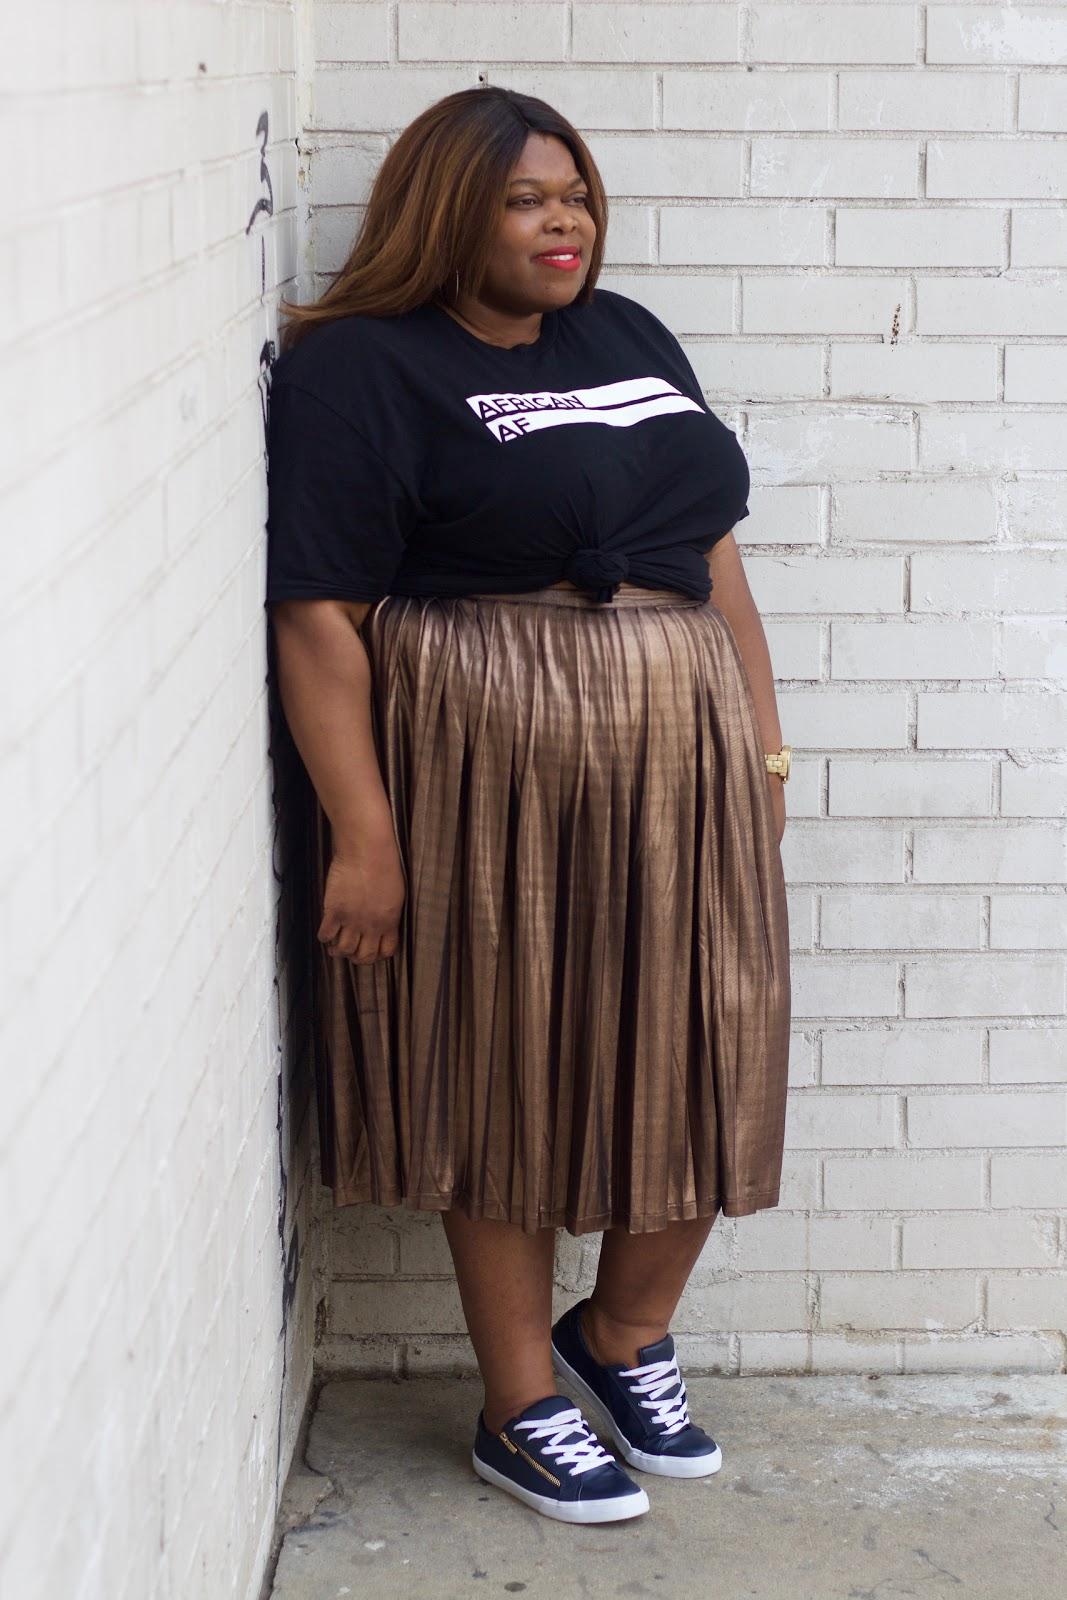 plus size style nigerian blogger